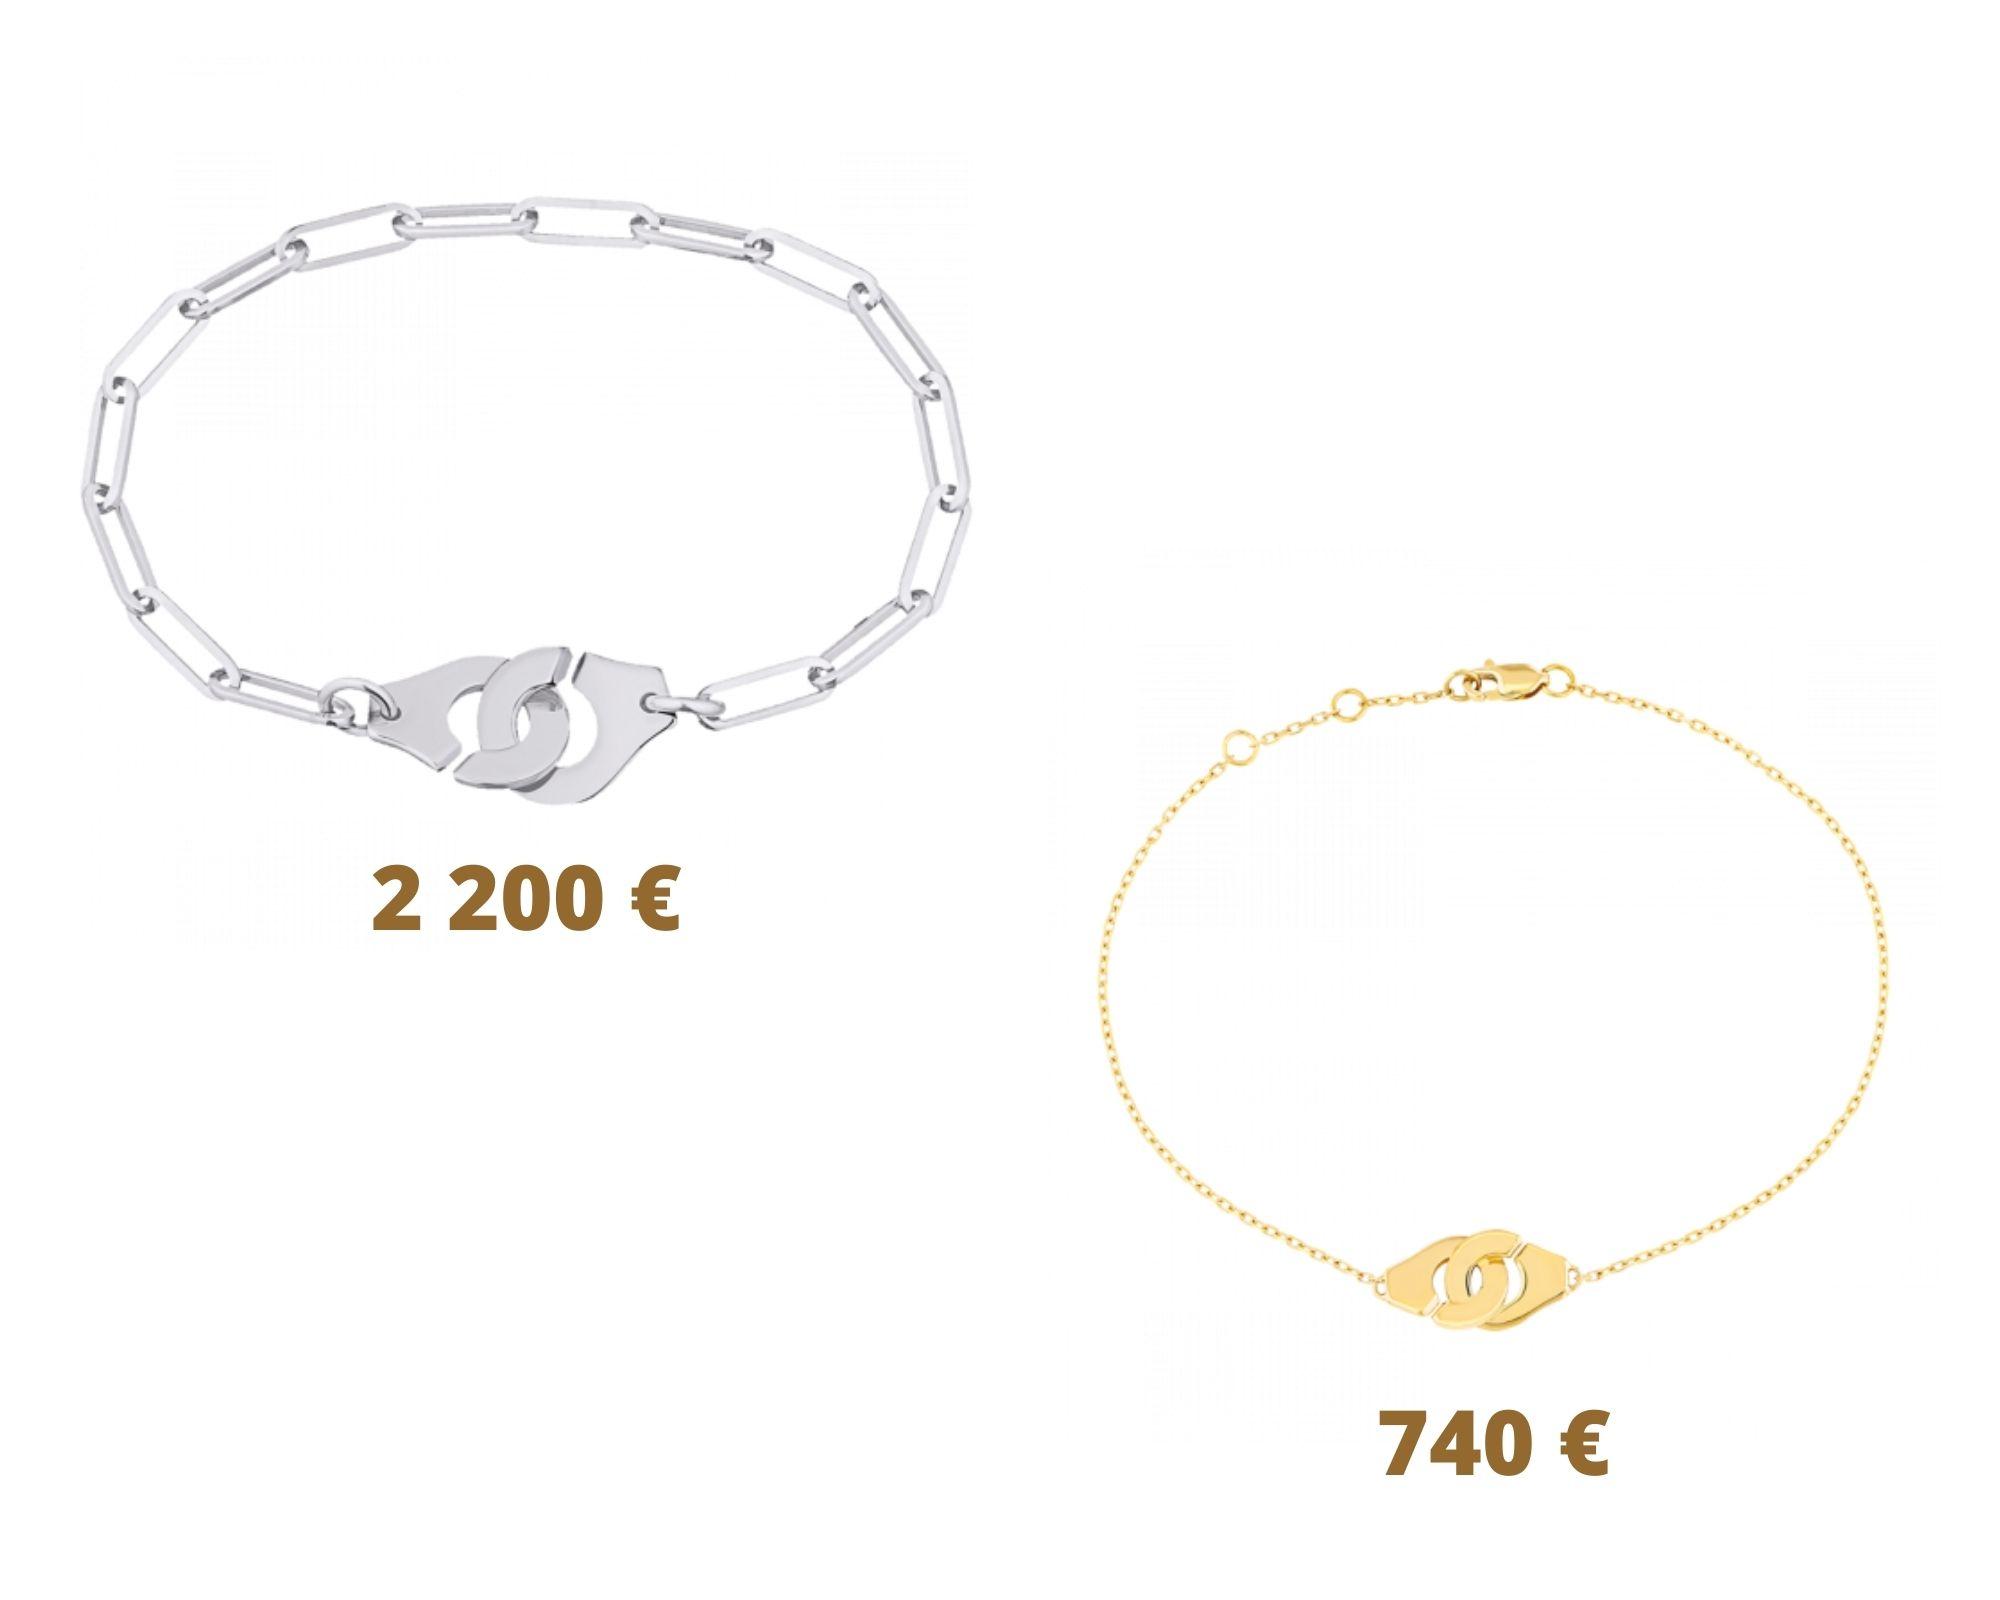 Prix des bracelets